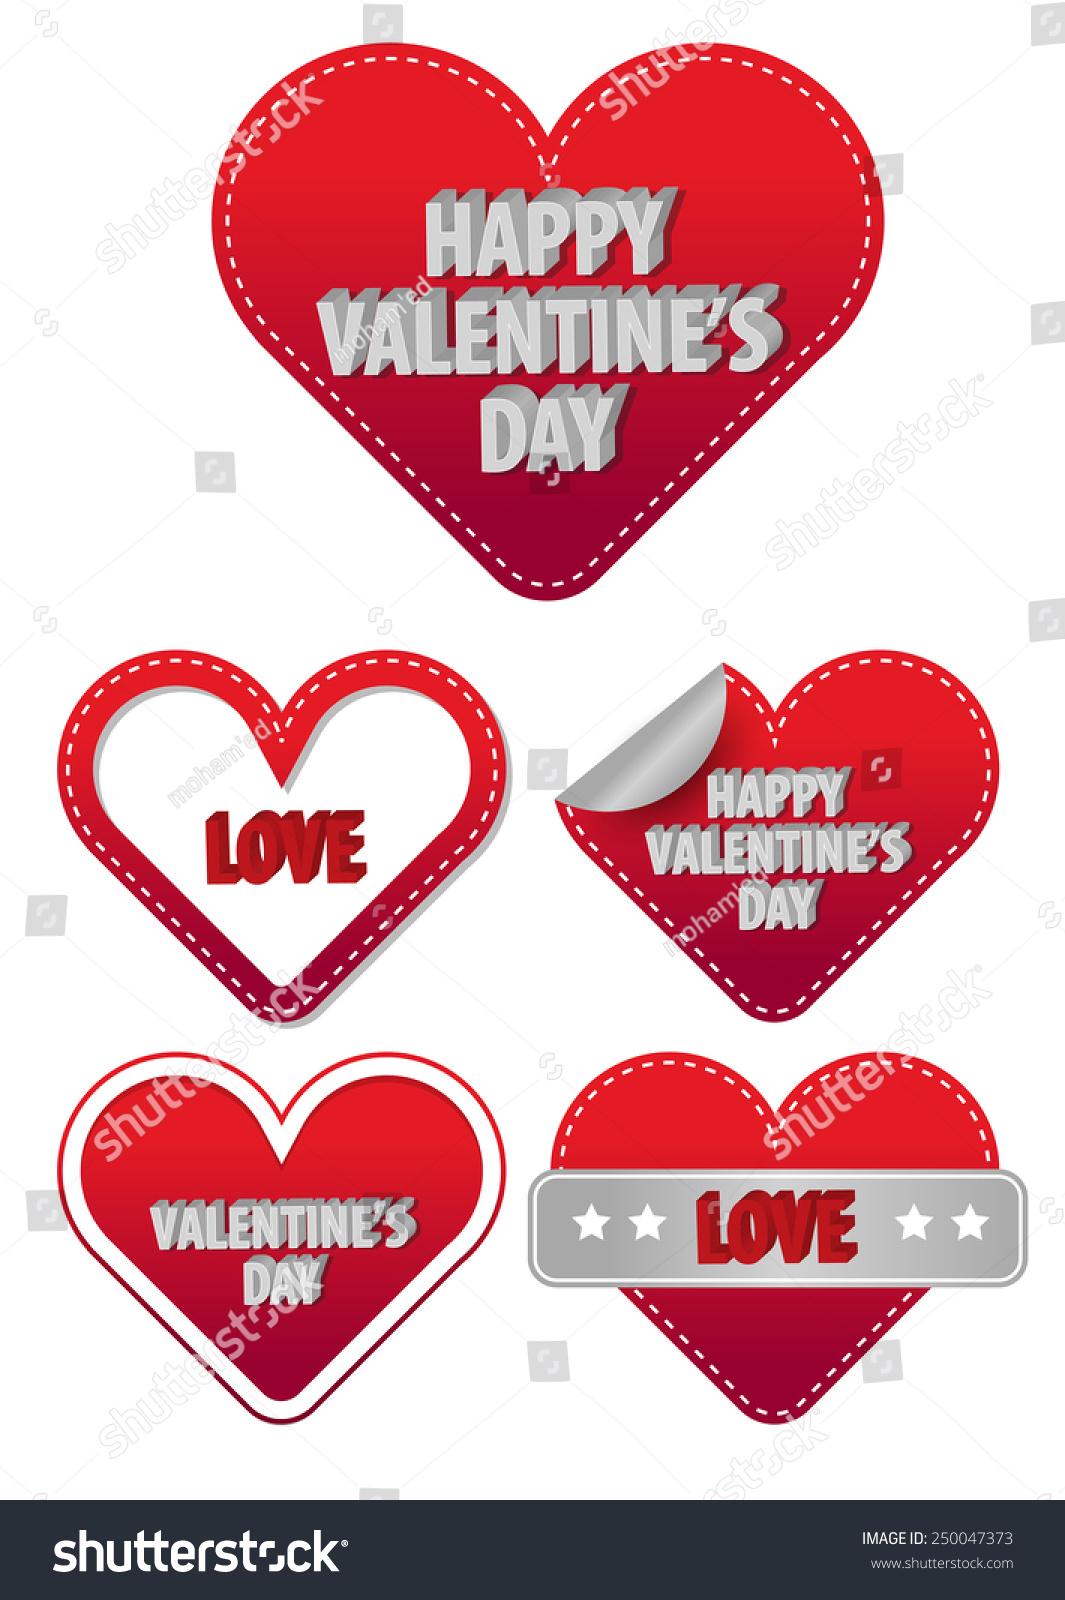 valentines day stickers vector - Valentines Day Stickers